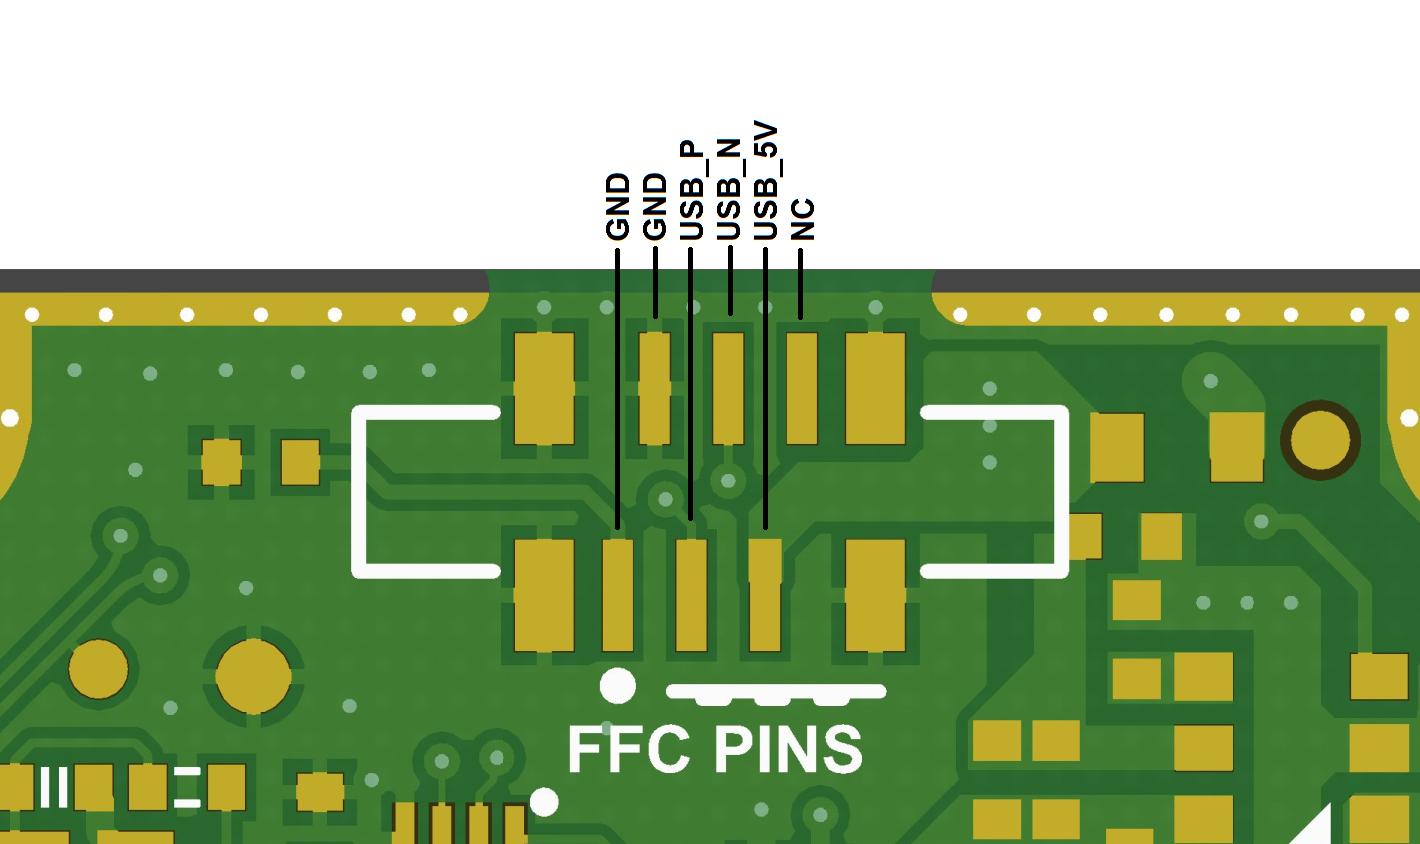 C2_FFC_USB_pinout.png